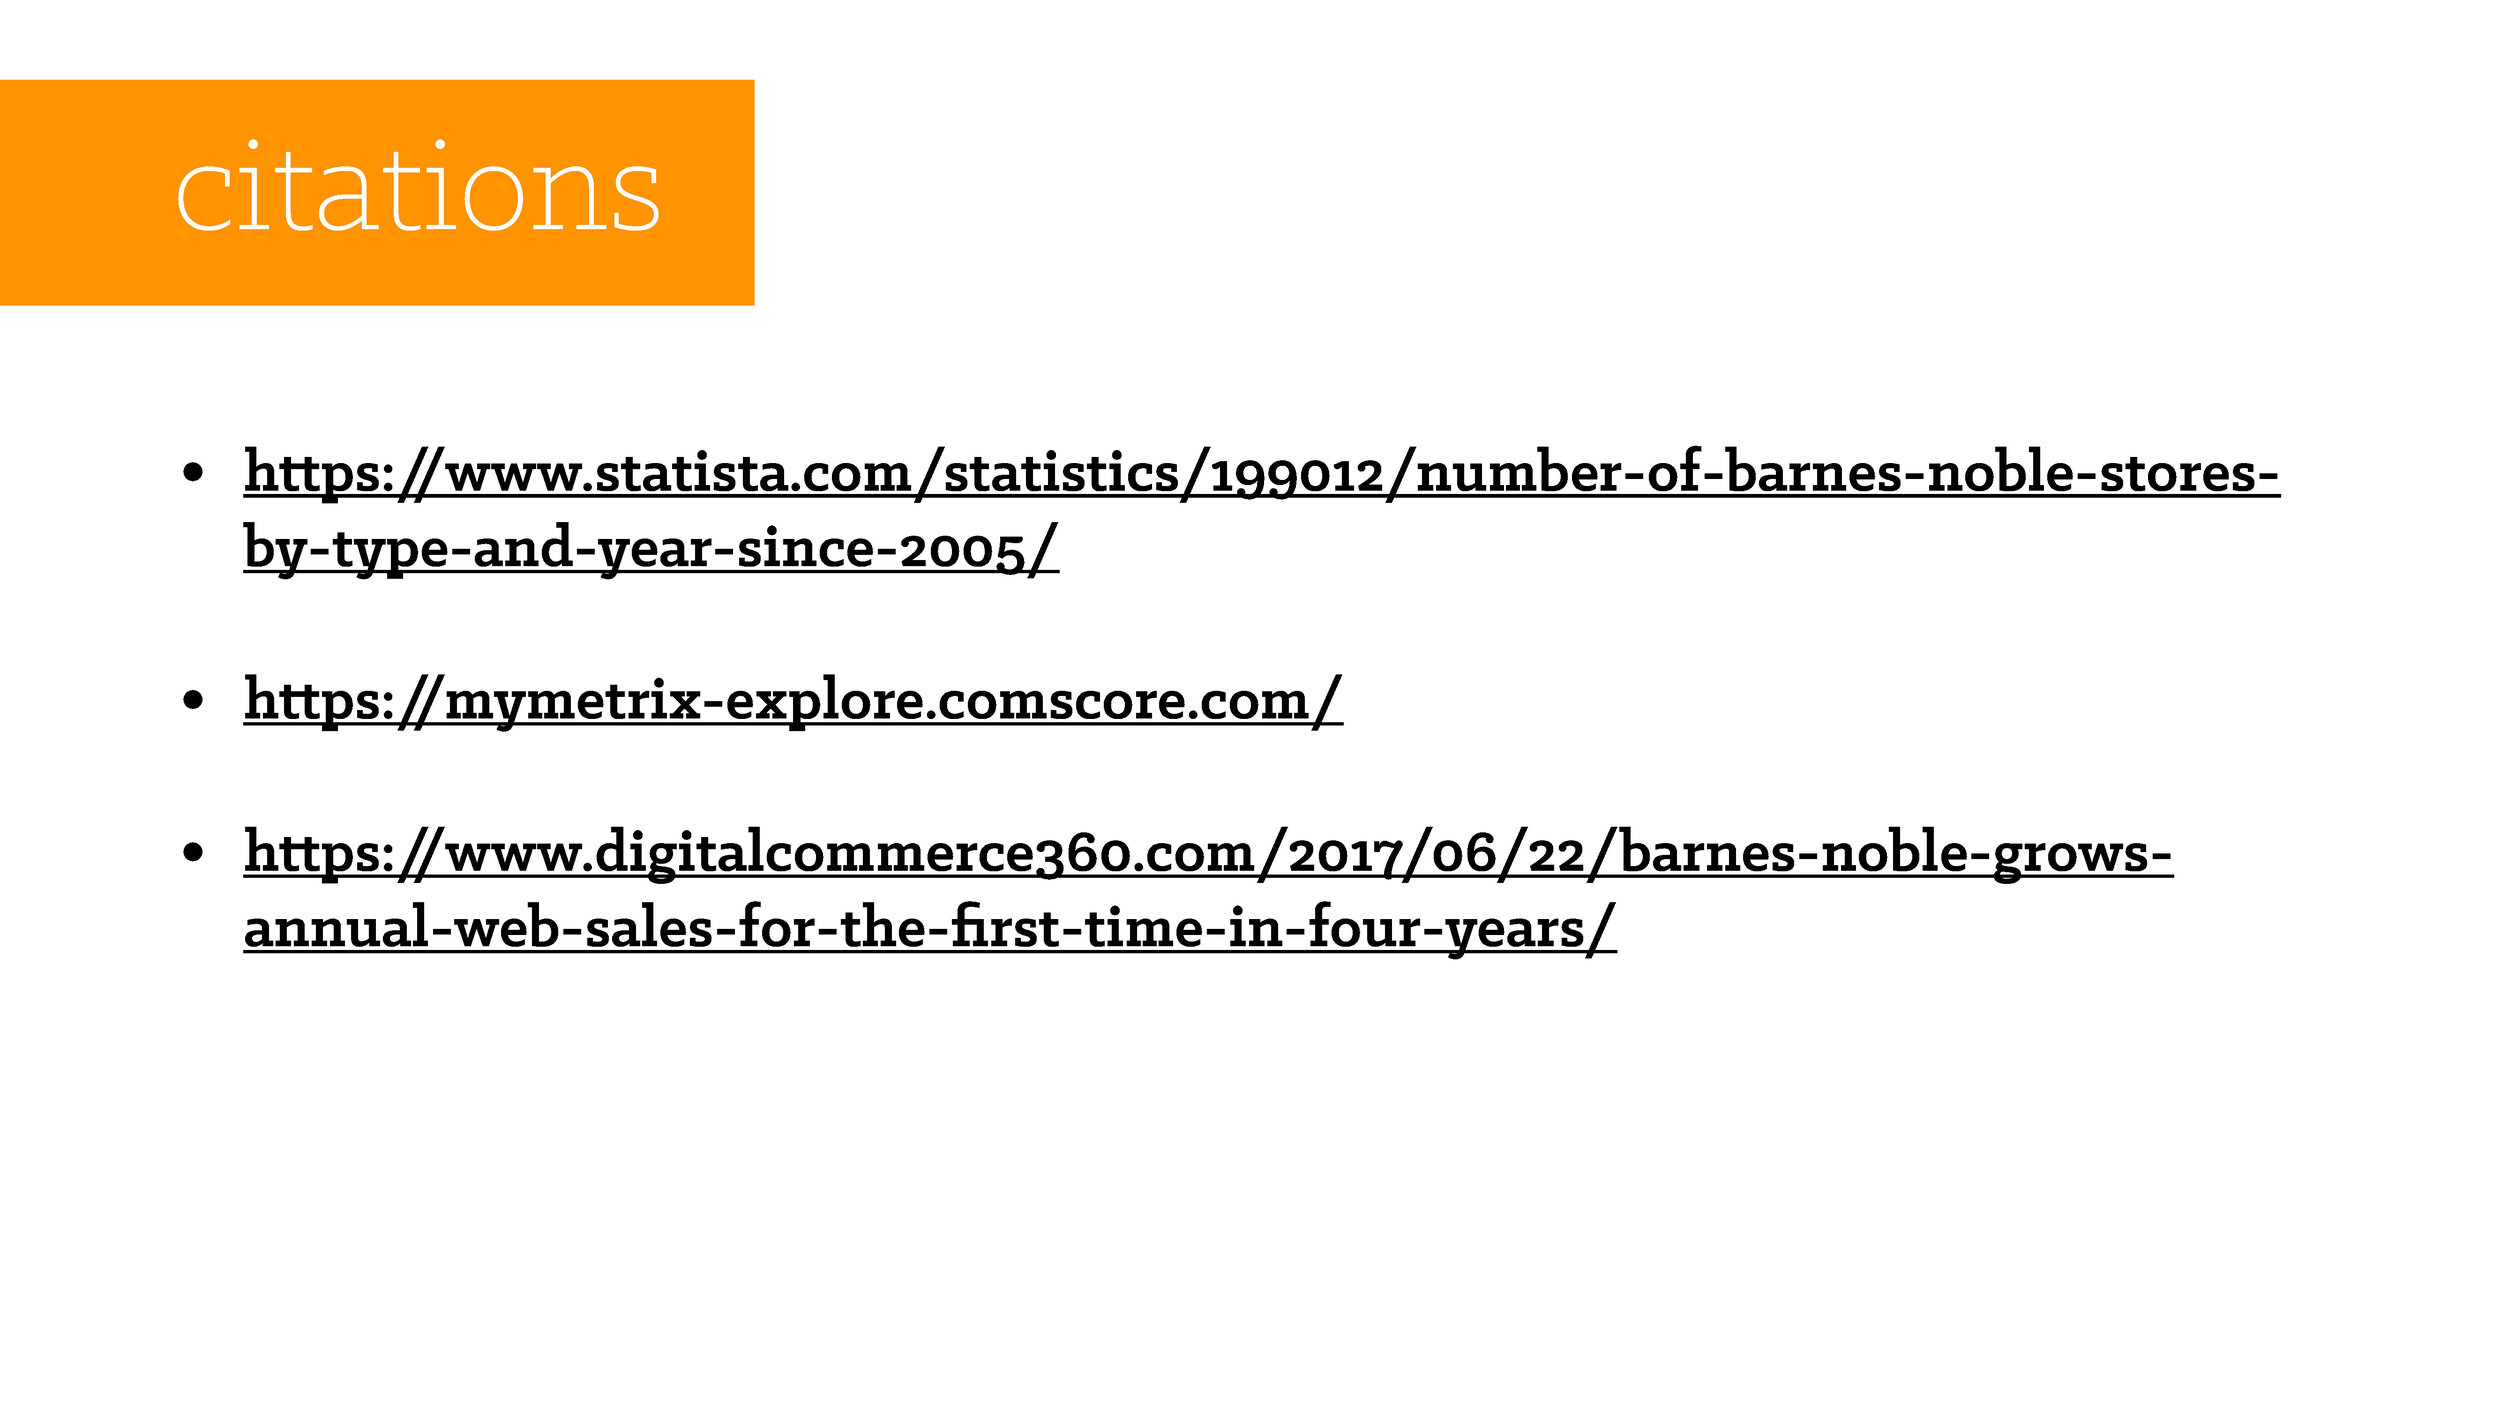 Lewman_comScore_Barnes&Noble_Page_19.jpg